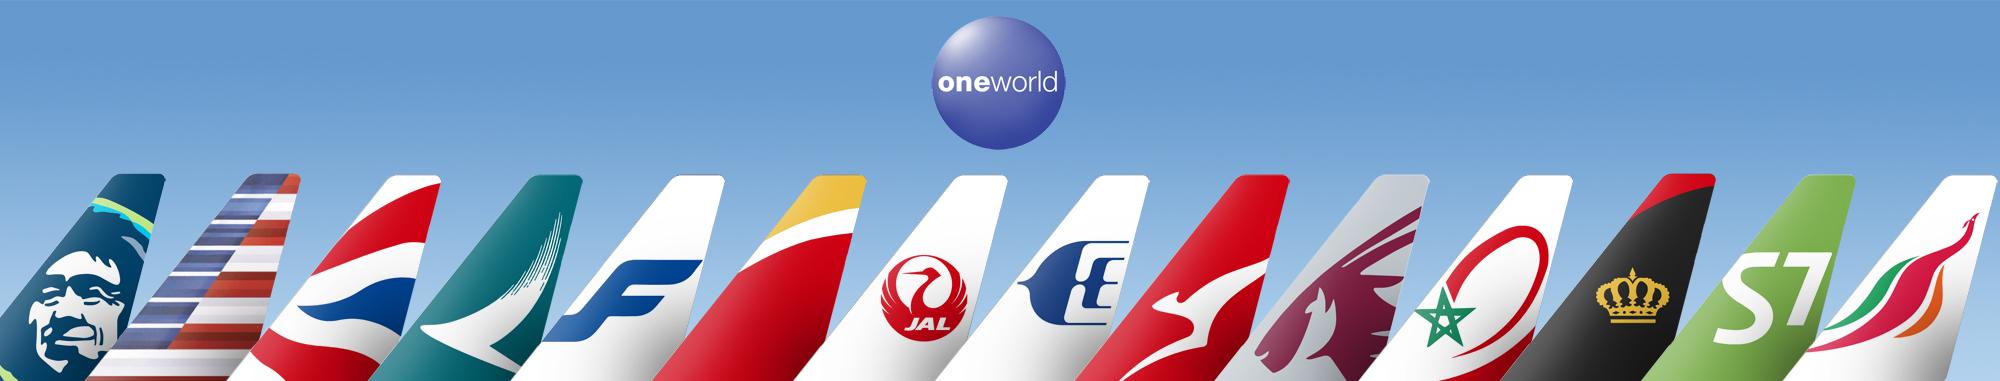 oneworld tailfins